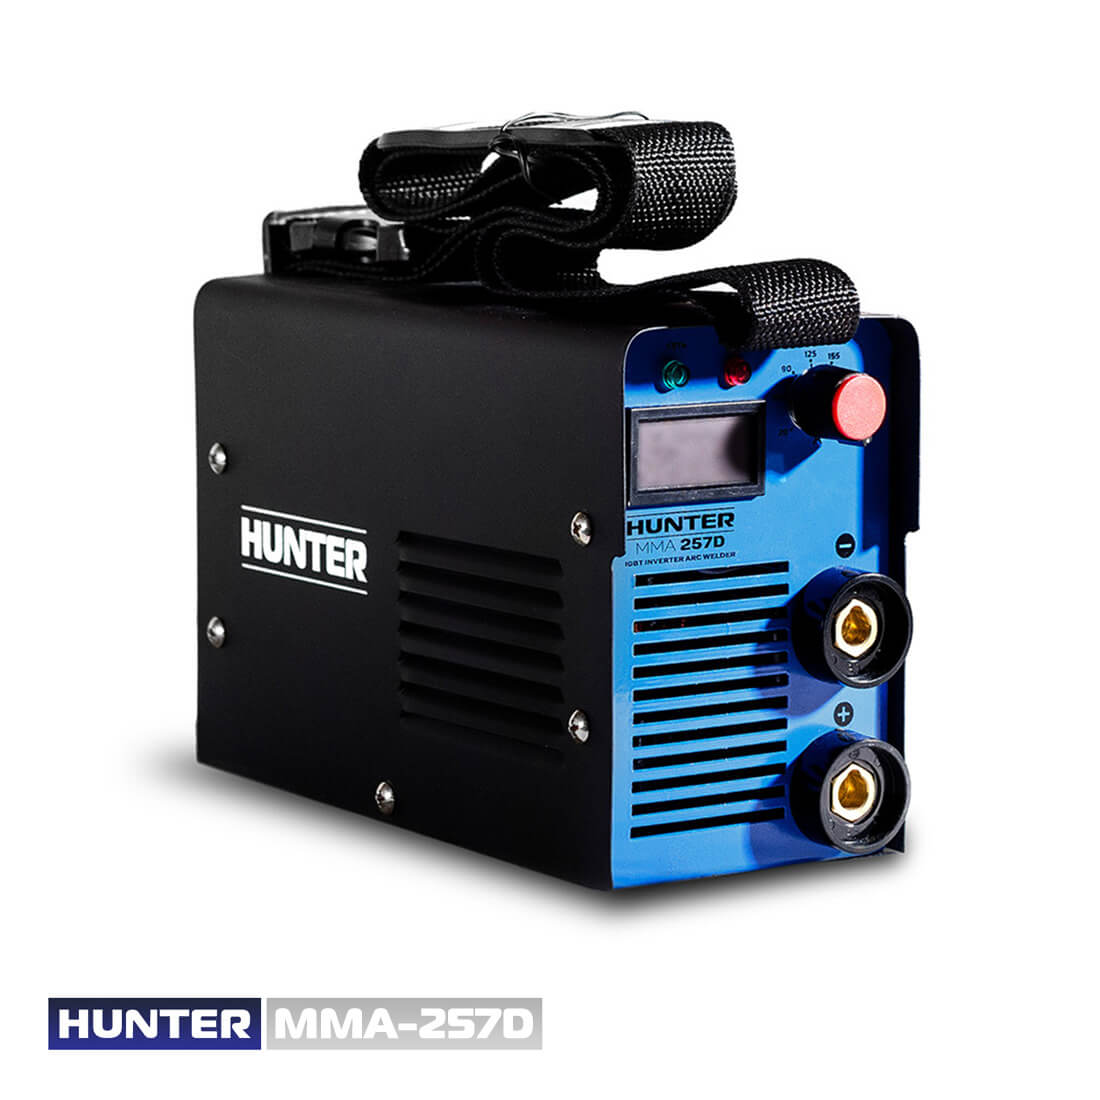 Фото Hunter MMA 257D (дуговий) цена 2250грн №1 — Hunter